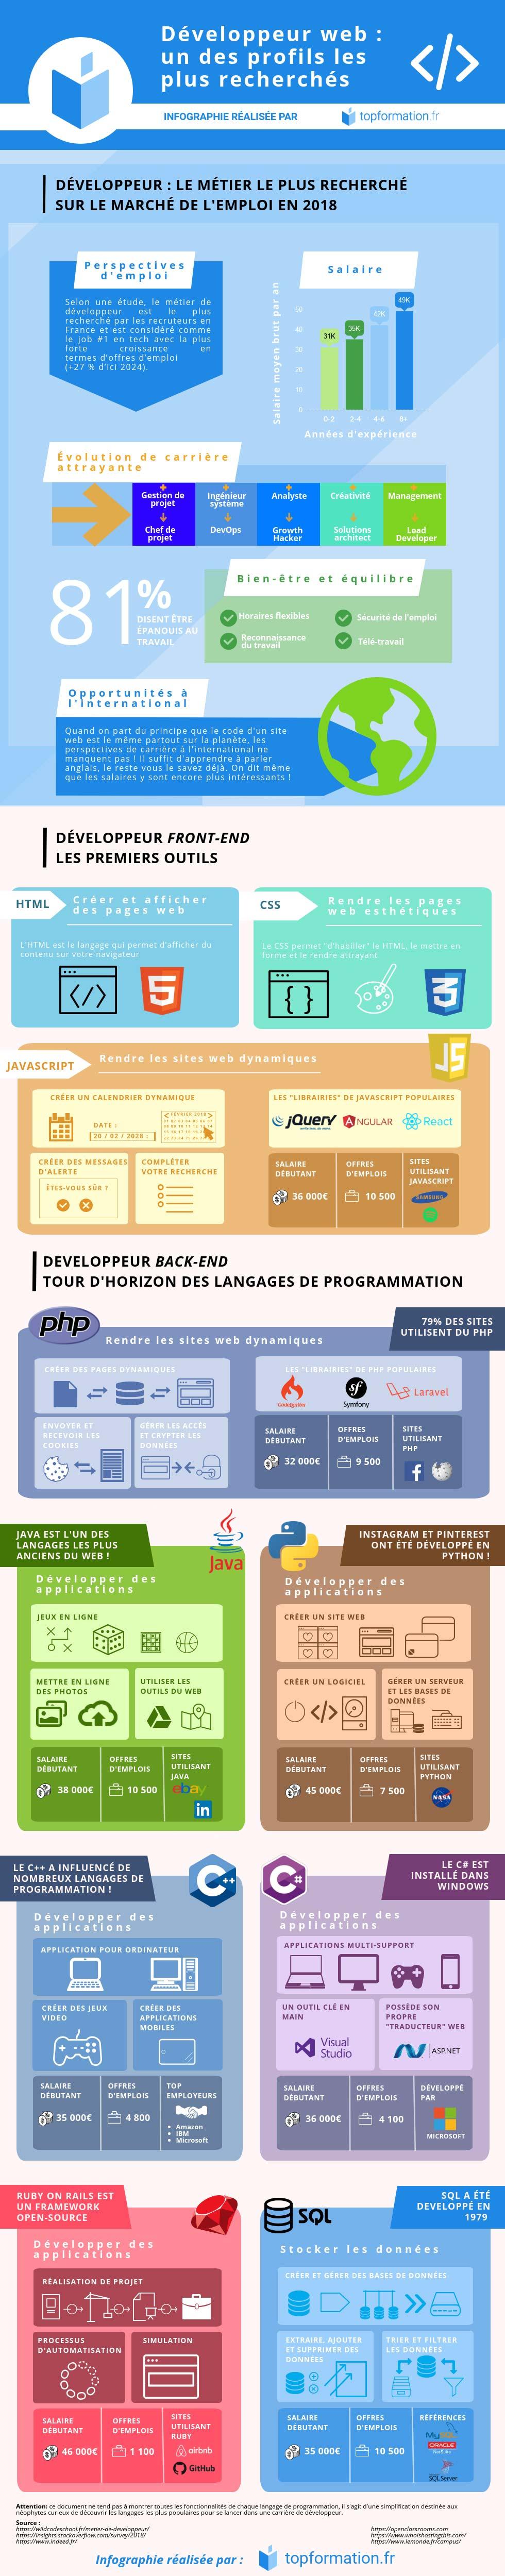 infographie metier developpeur web